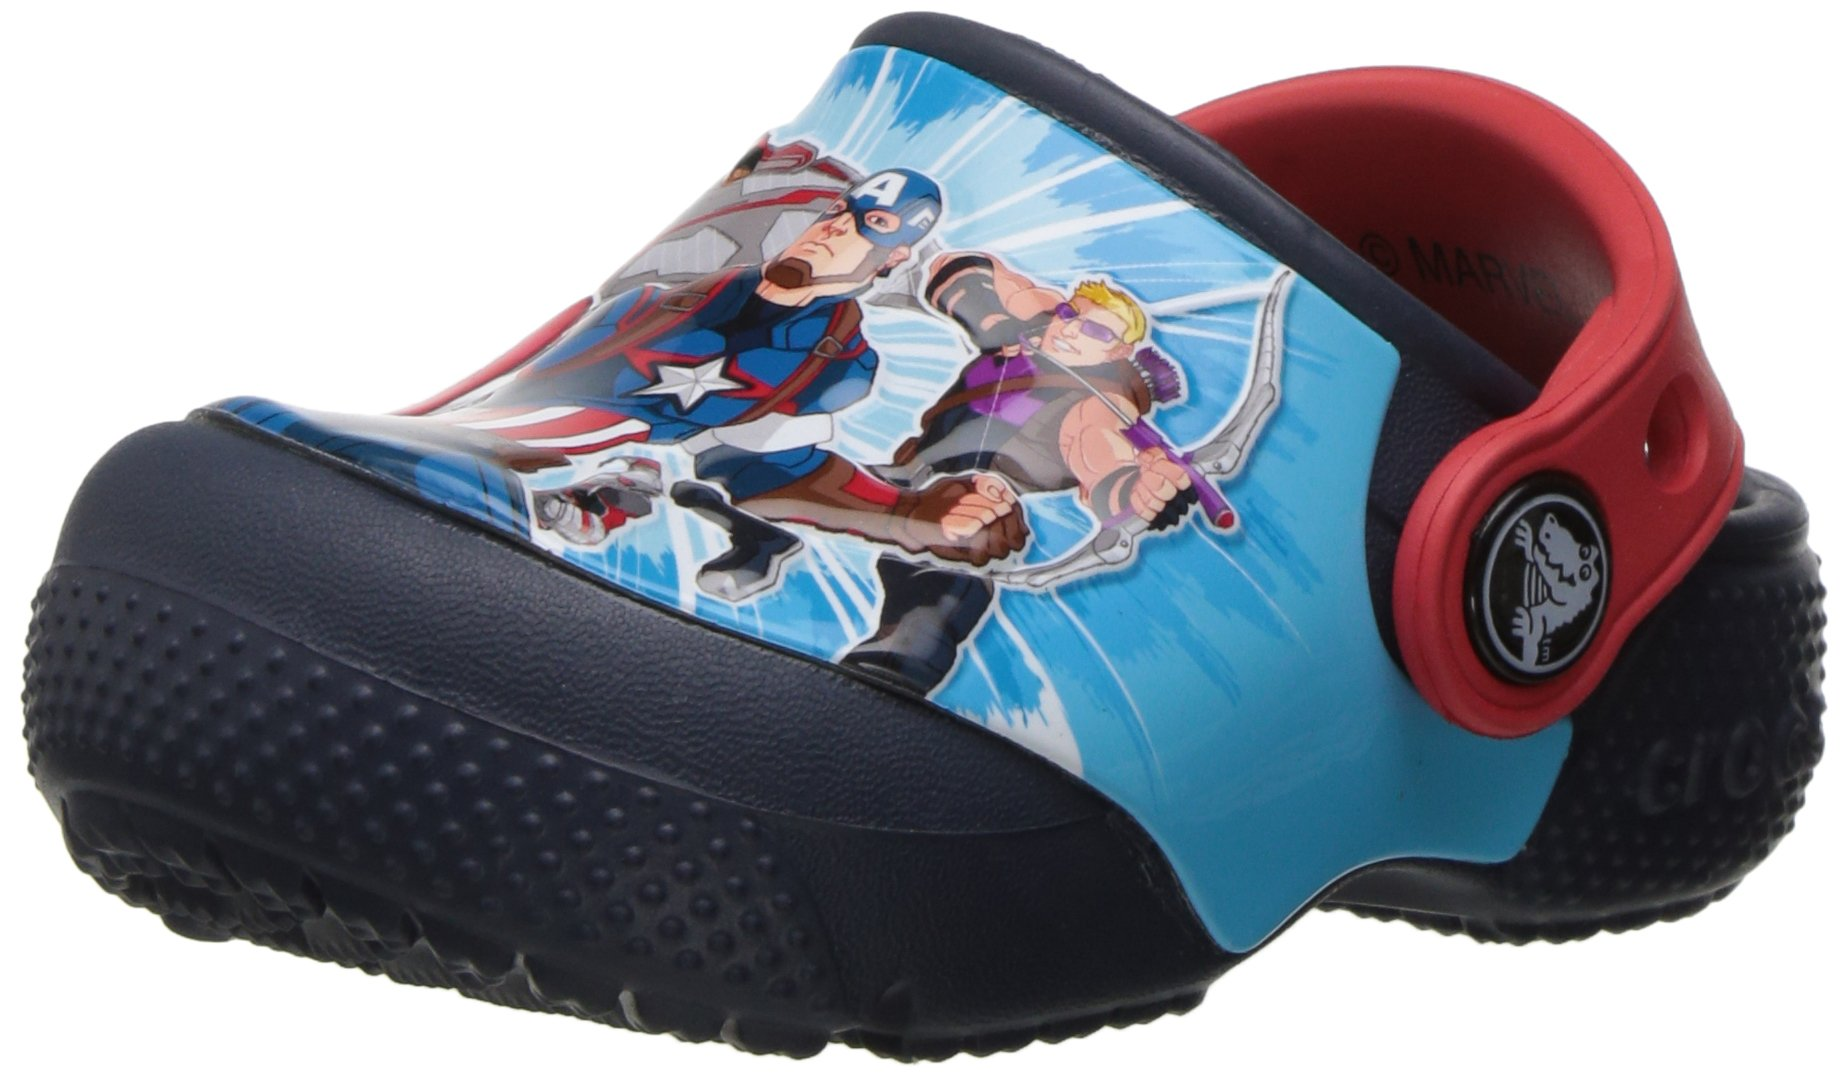 crocs Boys' Crocsfunlab Marvel Avengers Clog, Navy, 6 M US Toddler